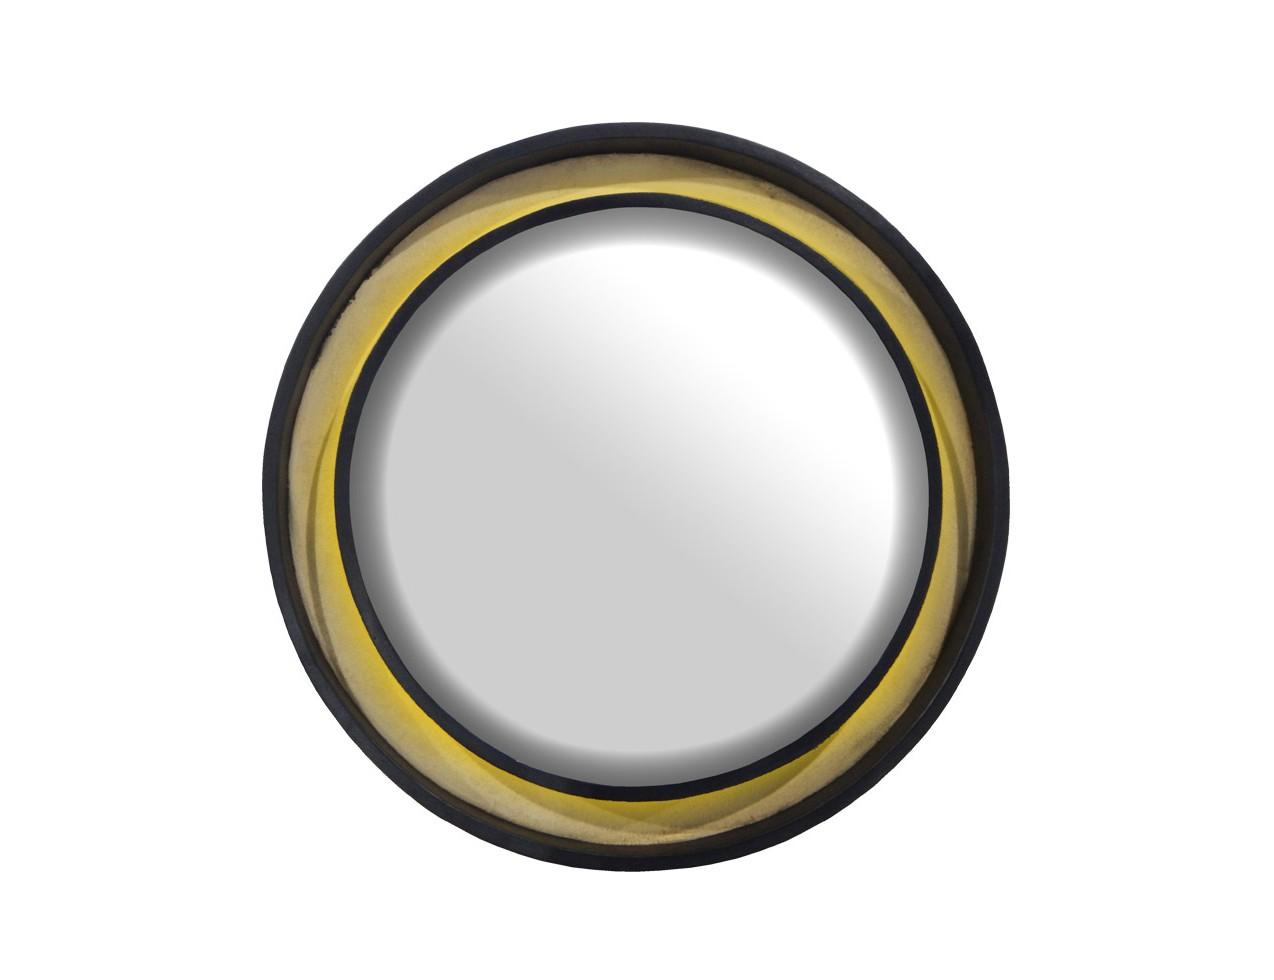 Зеркало ArtwerpenНастенные зеркала<br><br><br>Material: Стекло<br>Глубина см: 18